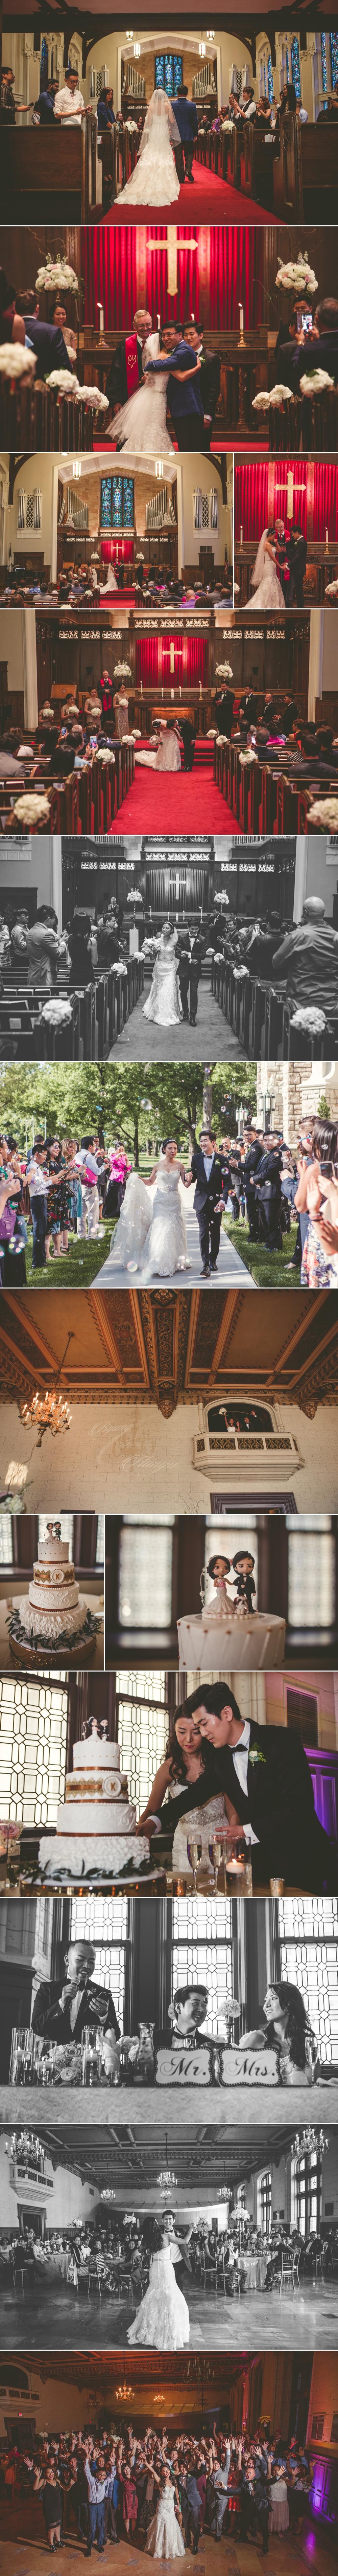 jason_domingues_photography_best_kansas_city_wedding_photographer_kc_weddings_korean_tea_ceremony_mark_twain_ballroom_00031.jpg